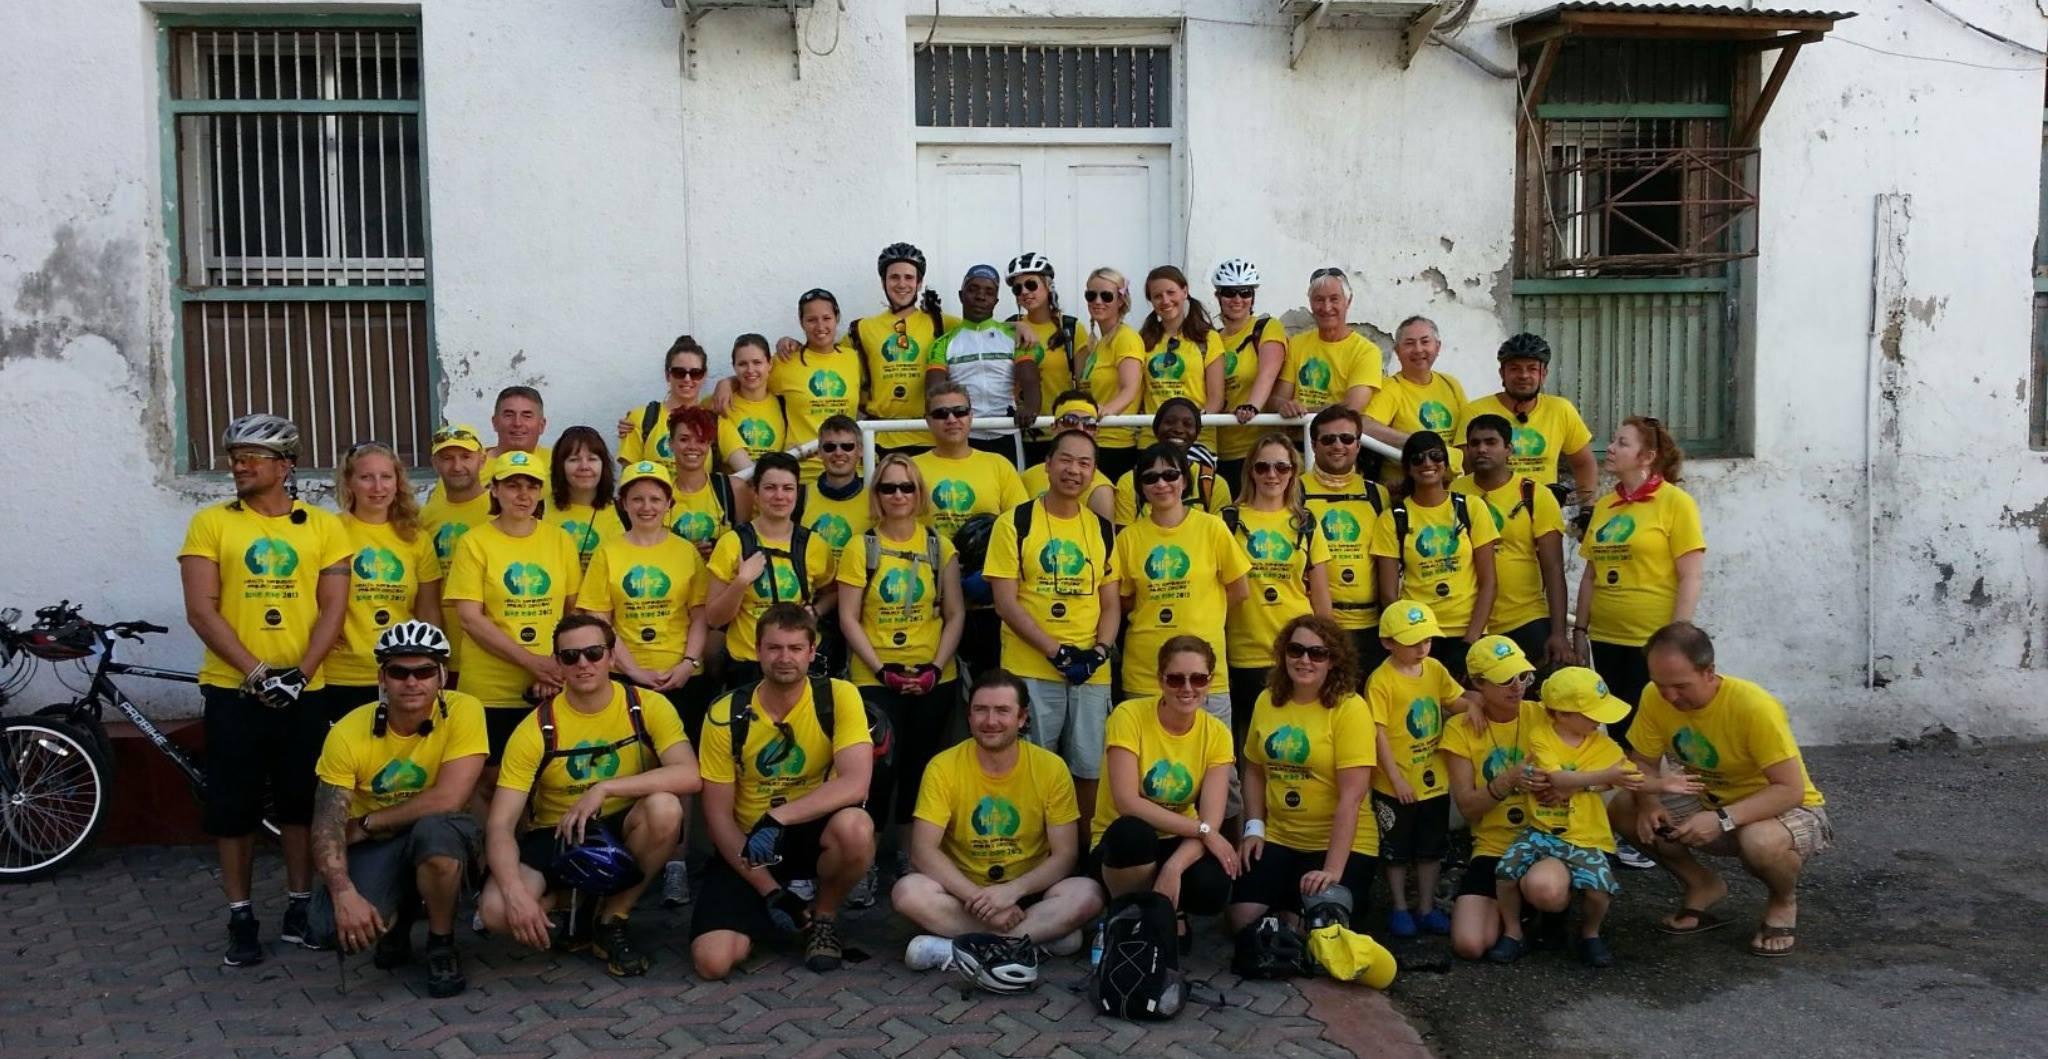 The 2013 HIPZ cycle ride team